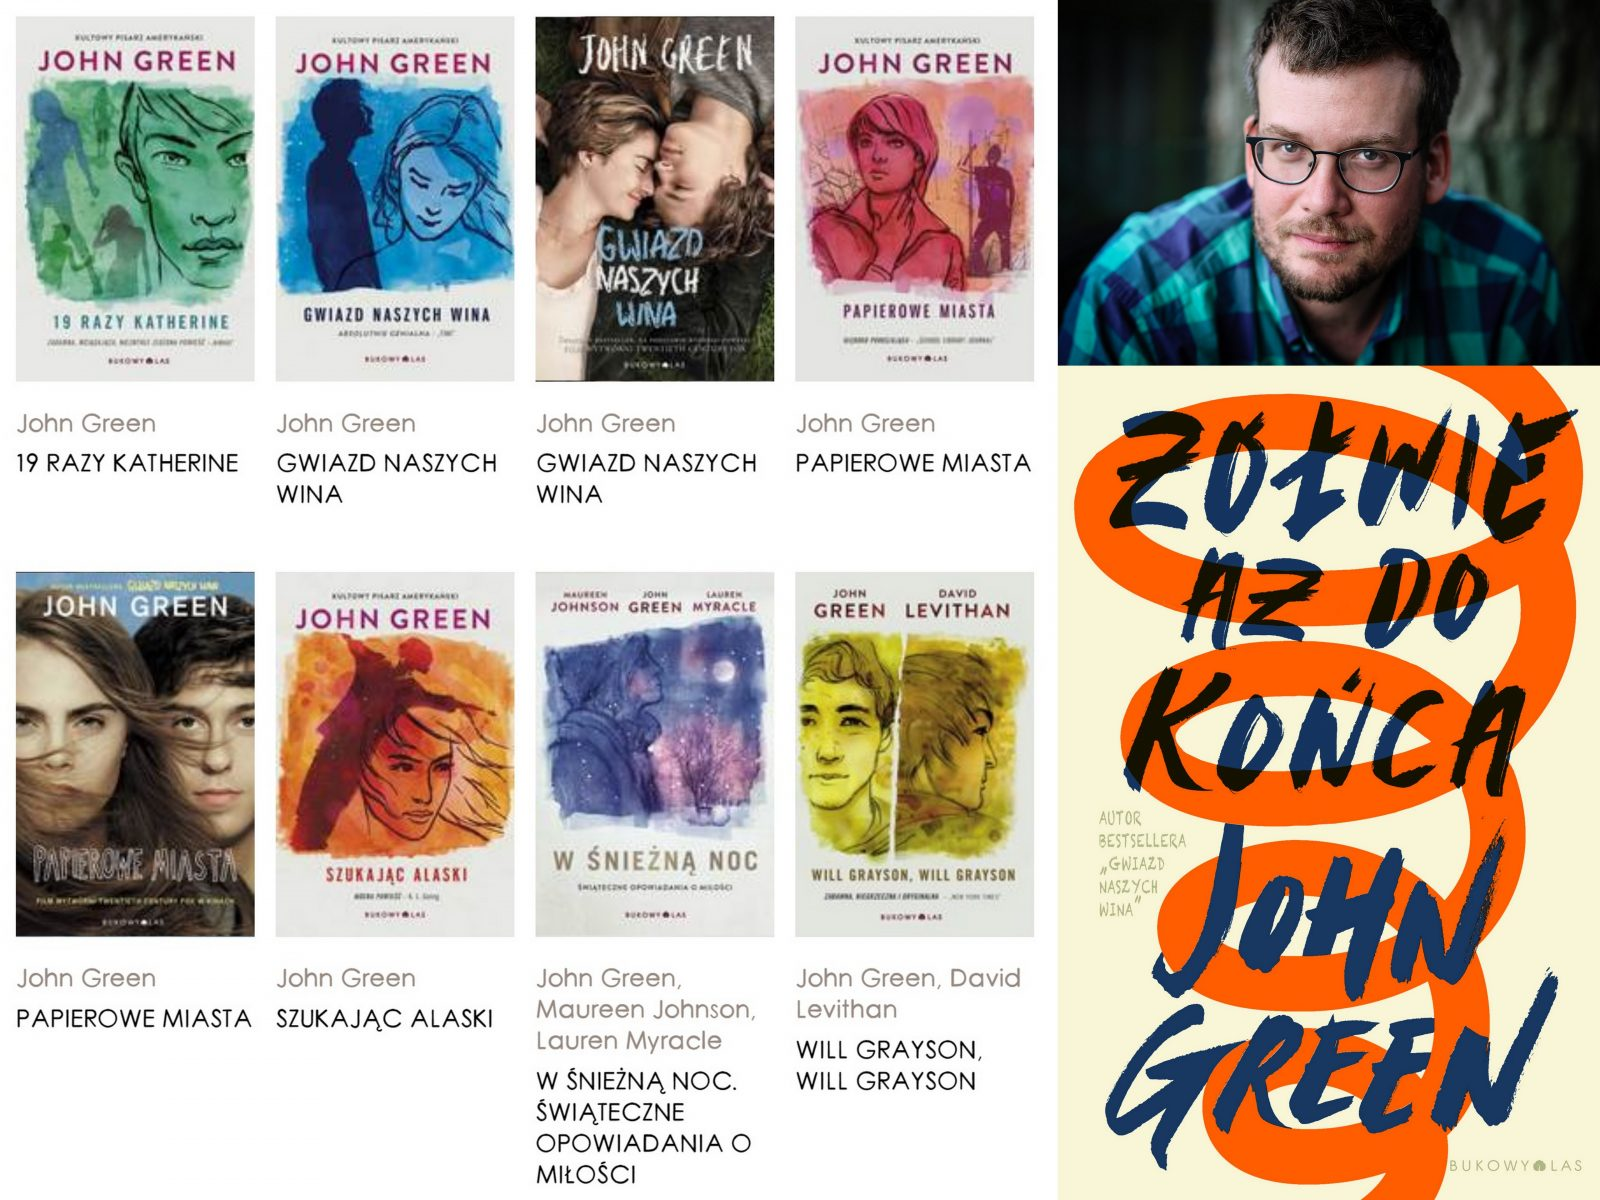 zolwie-az-do-konca-john-green-fragment-powiesci